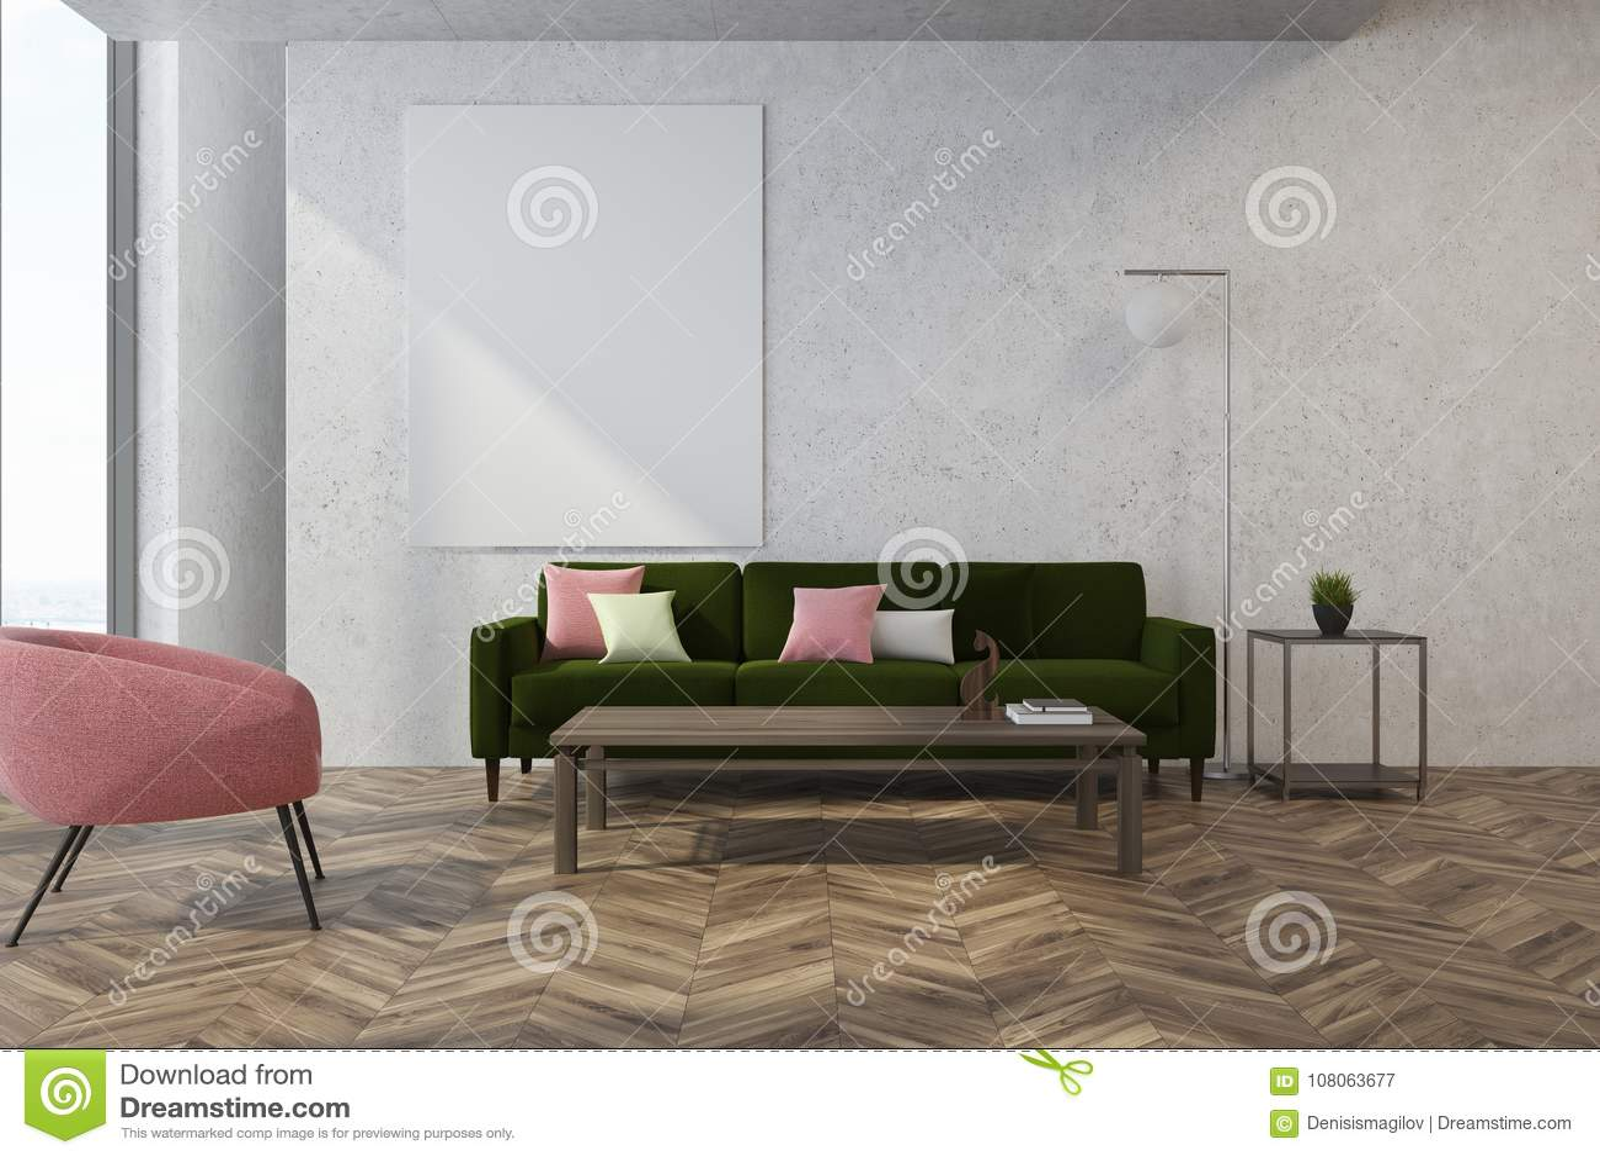 White Living Room, Pink Armchair Stock Illustration - Illustration ...